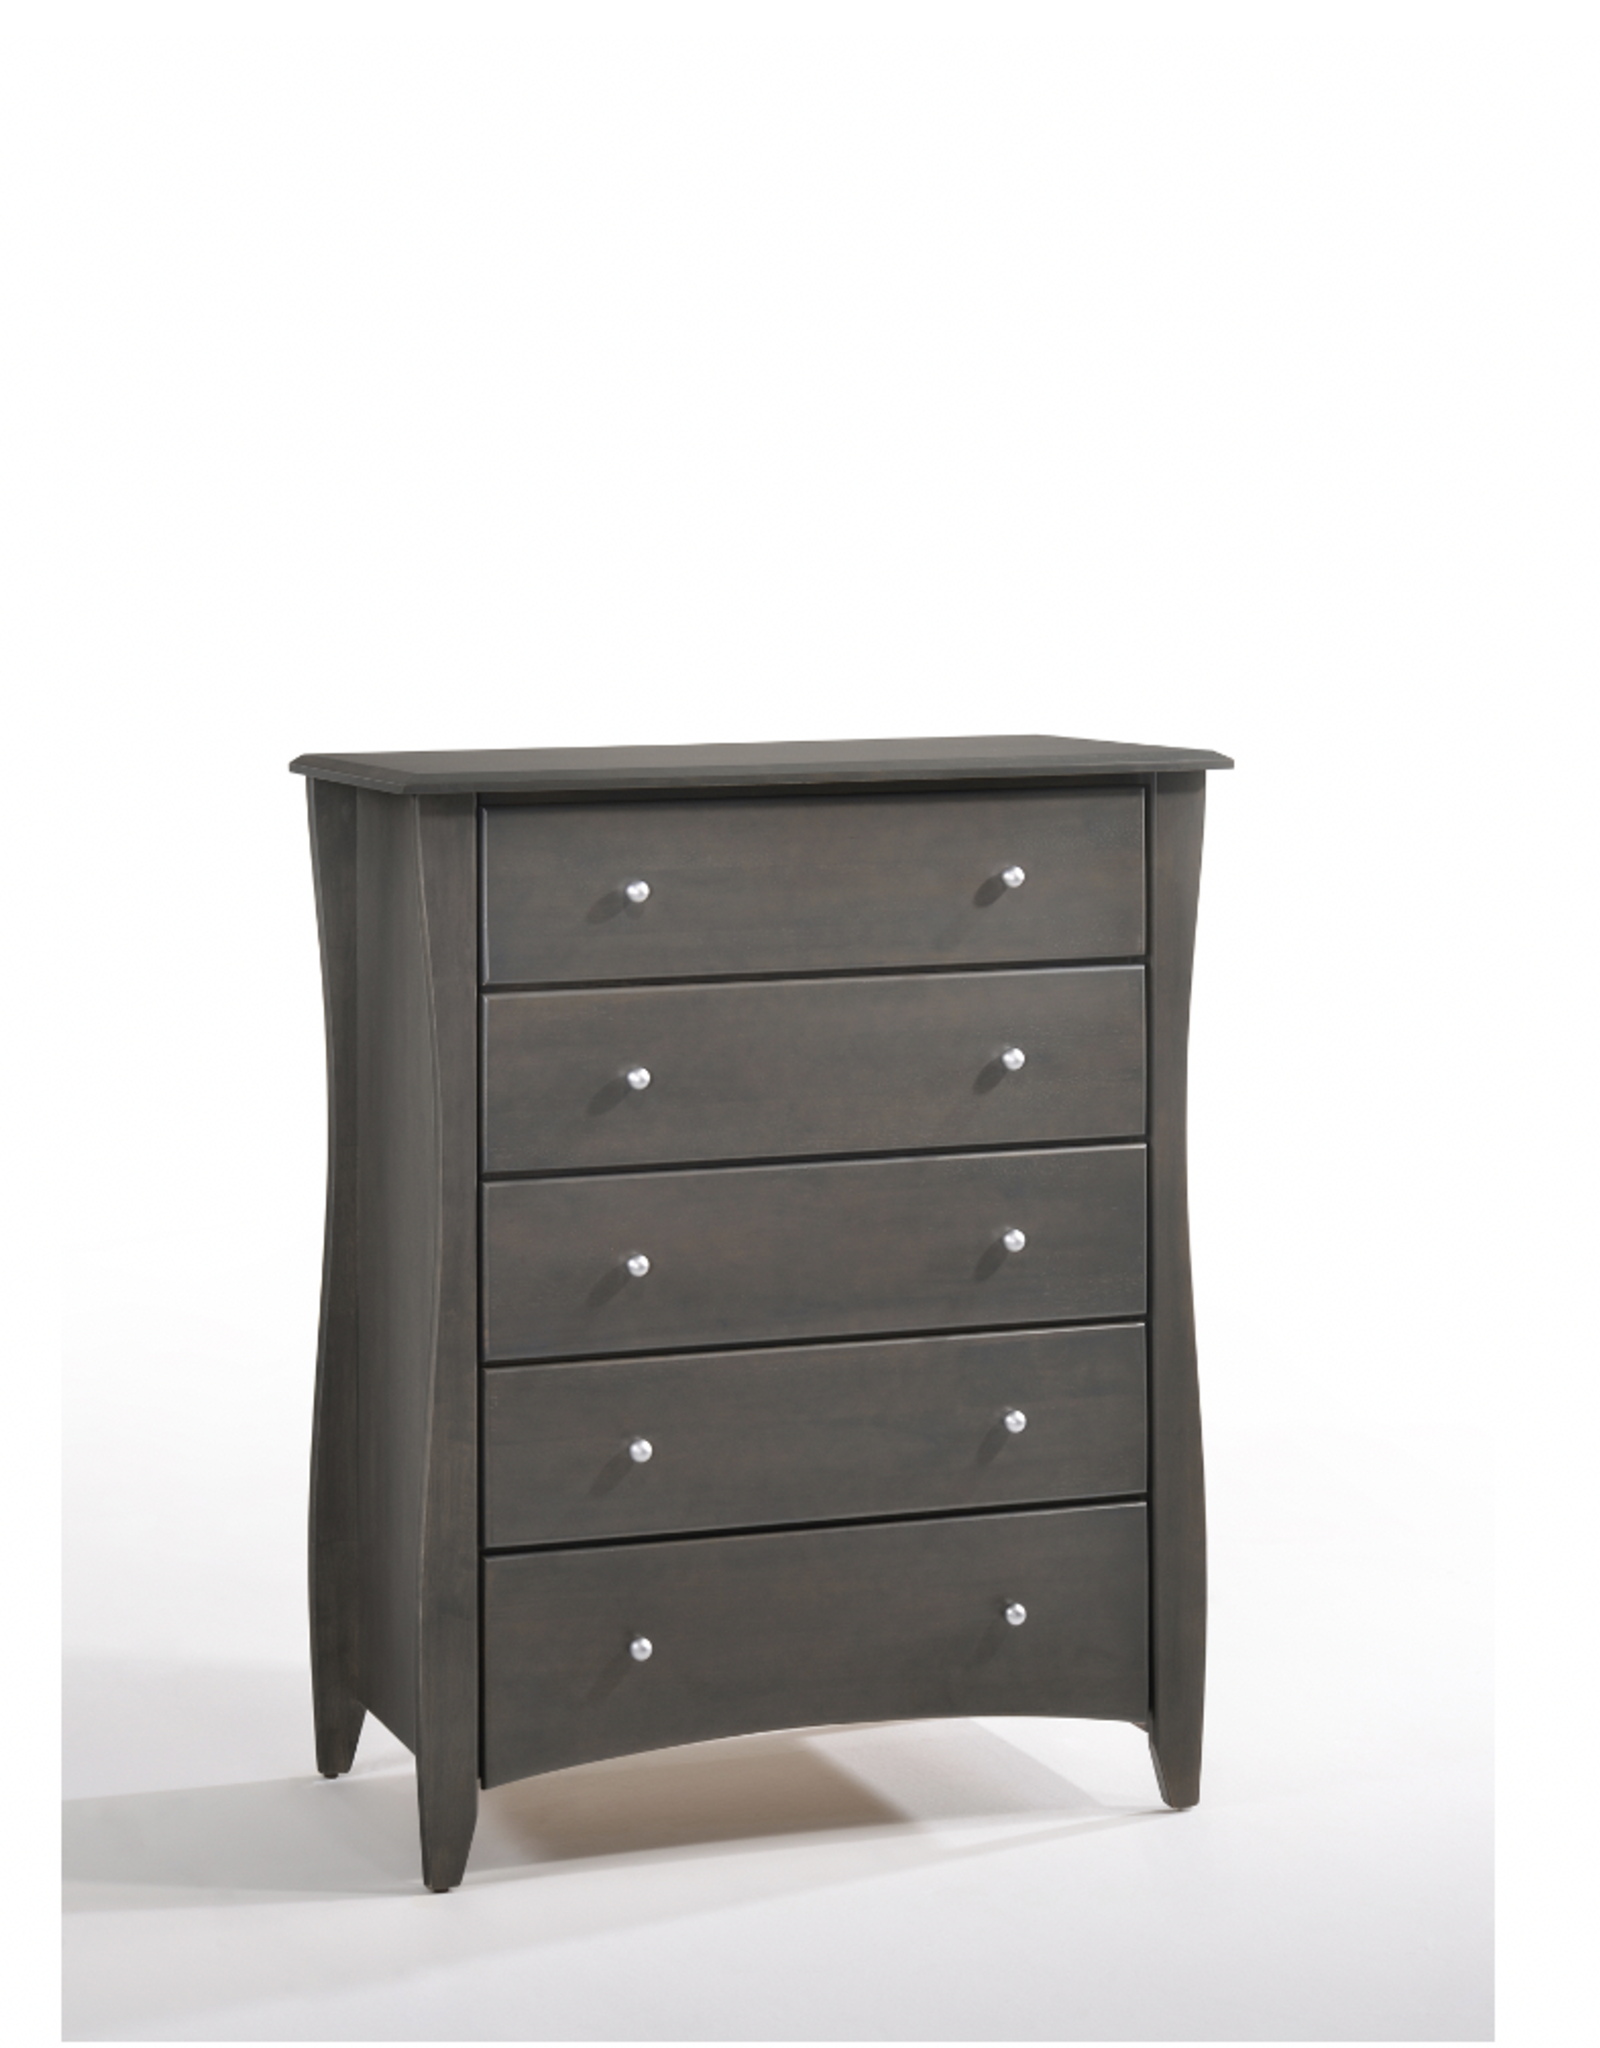 Clove 5-Drawer Dresser